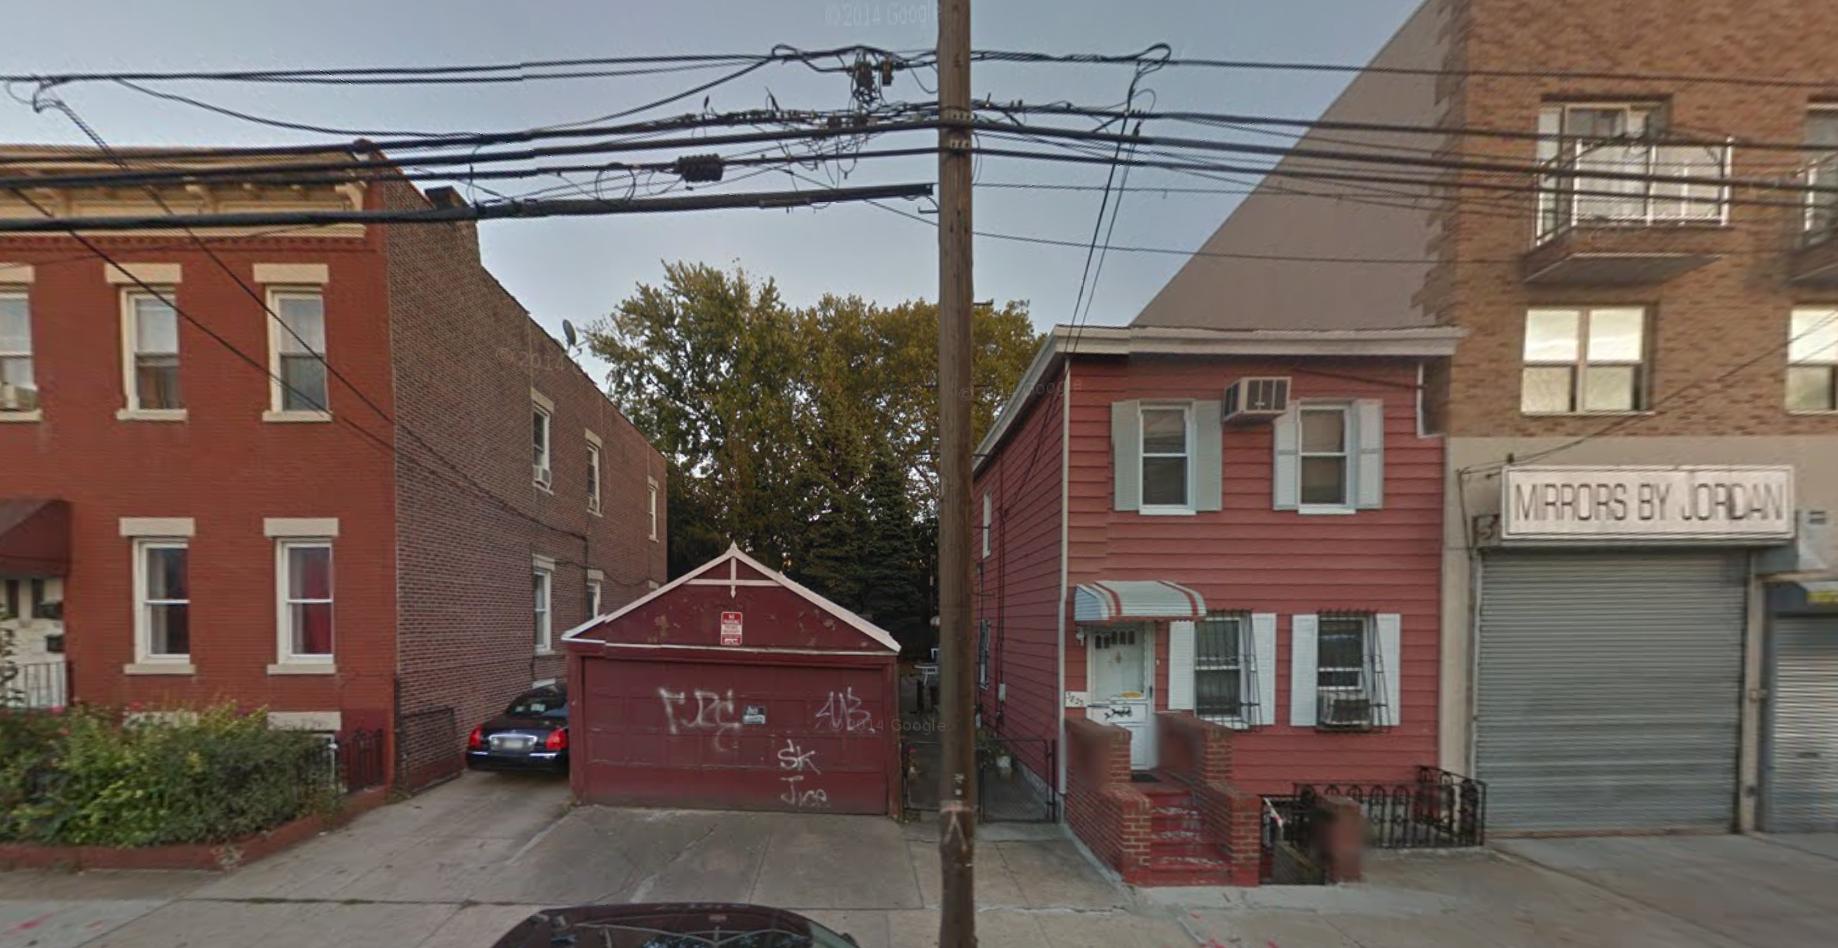 38-23 28th Street, image via Google Maps